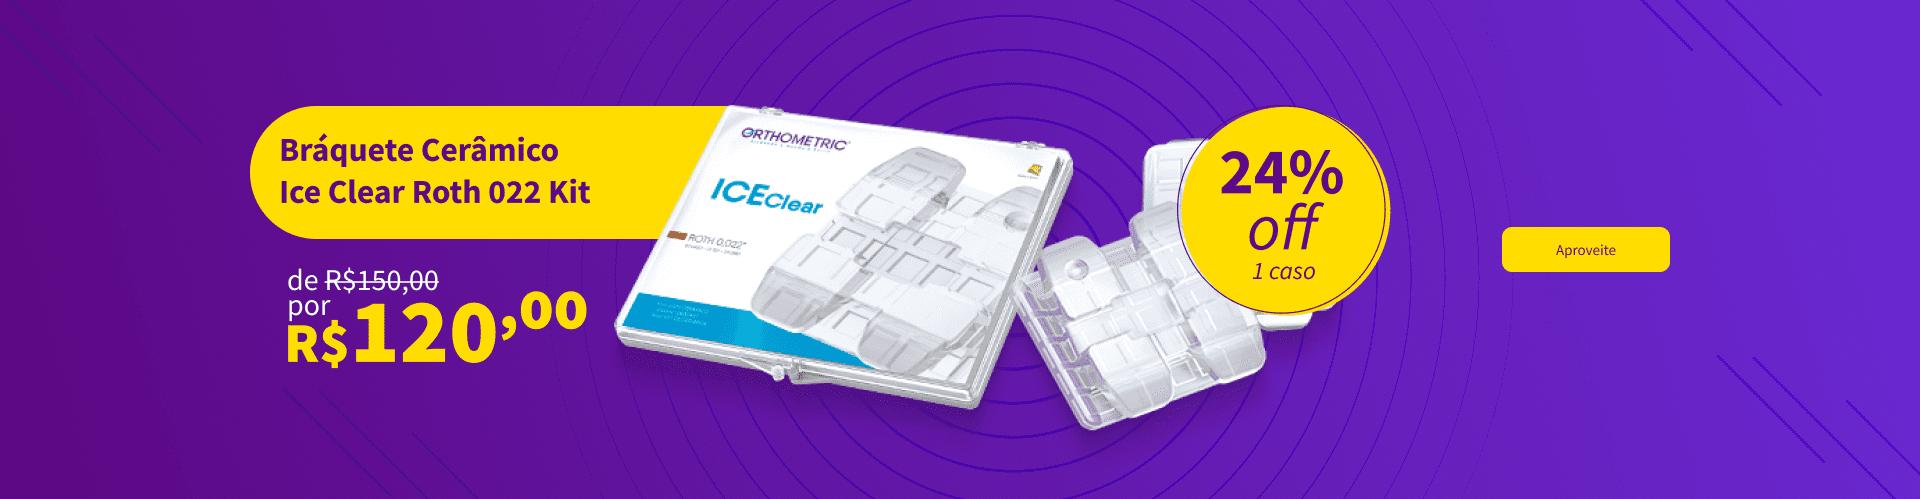 Confira Bráquete Cerâmico Ice Clear Roth 022 Kit da Orthometric com 24% OFF   Dental Cremer